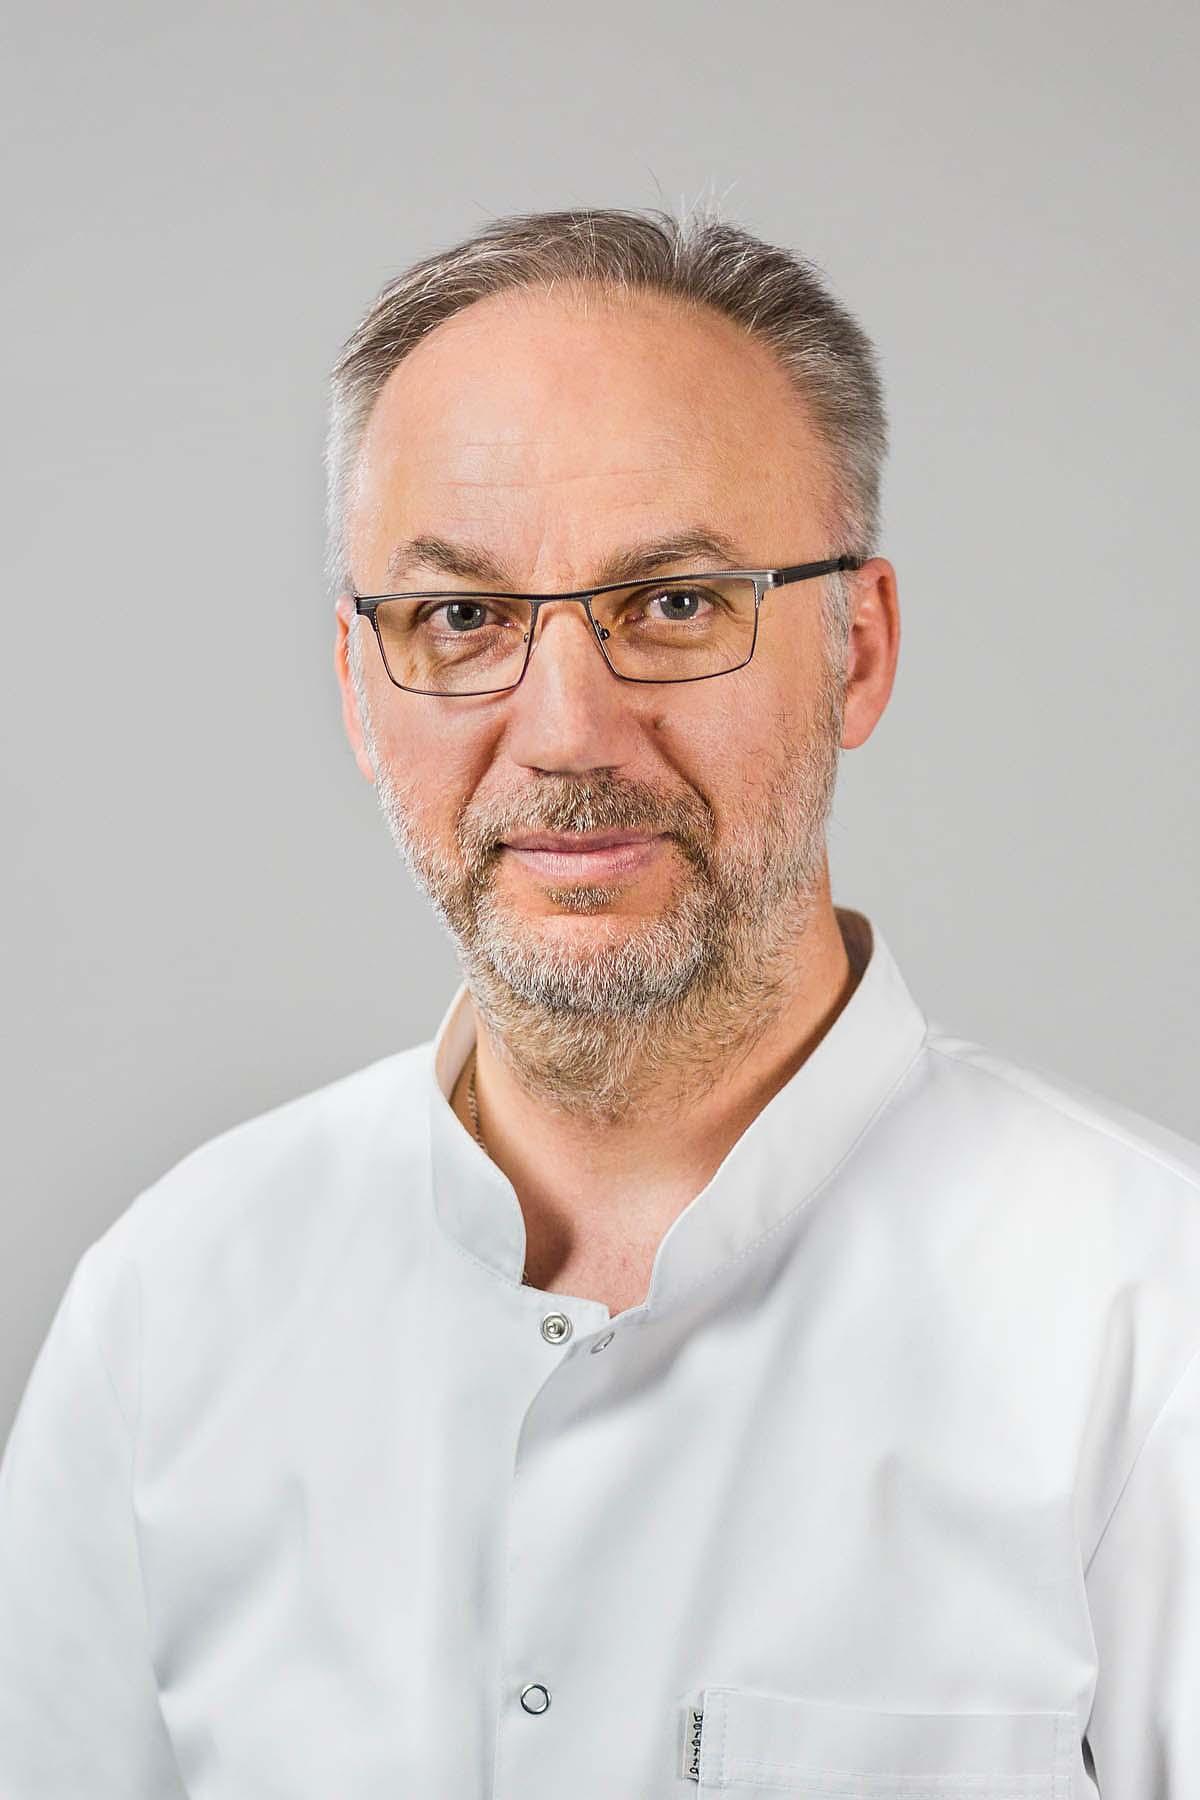 dr n. med. Grzegorz Kiwic